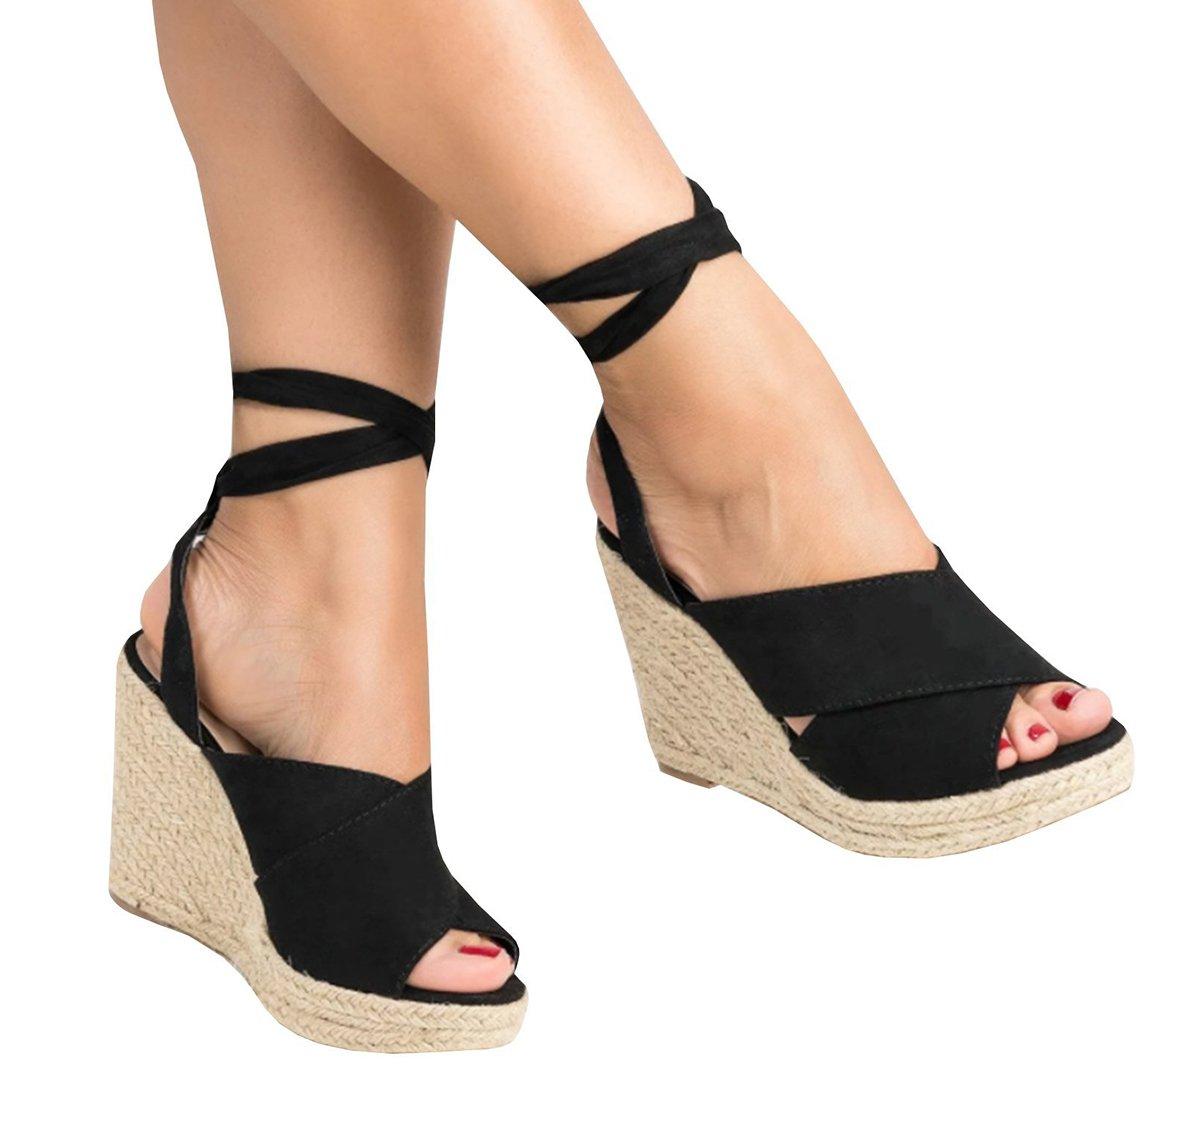 50af839375112 Fashare Womens Tie Lace Up Peep Toe Espadrille Platform Wedges ...